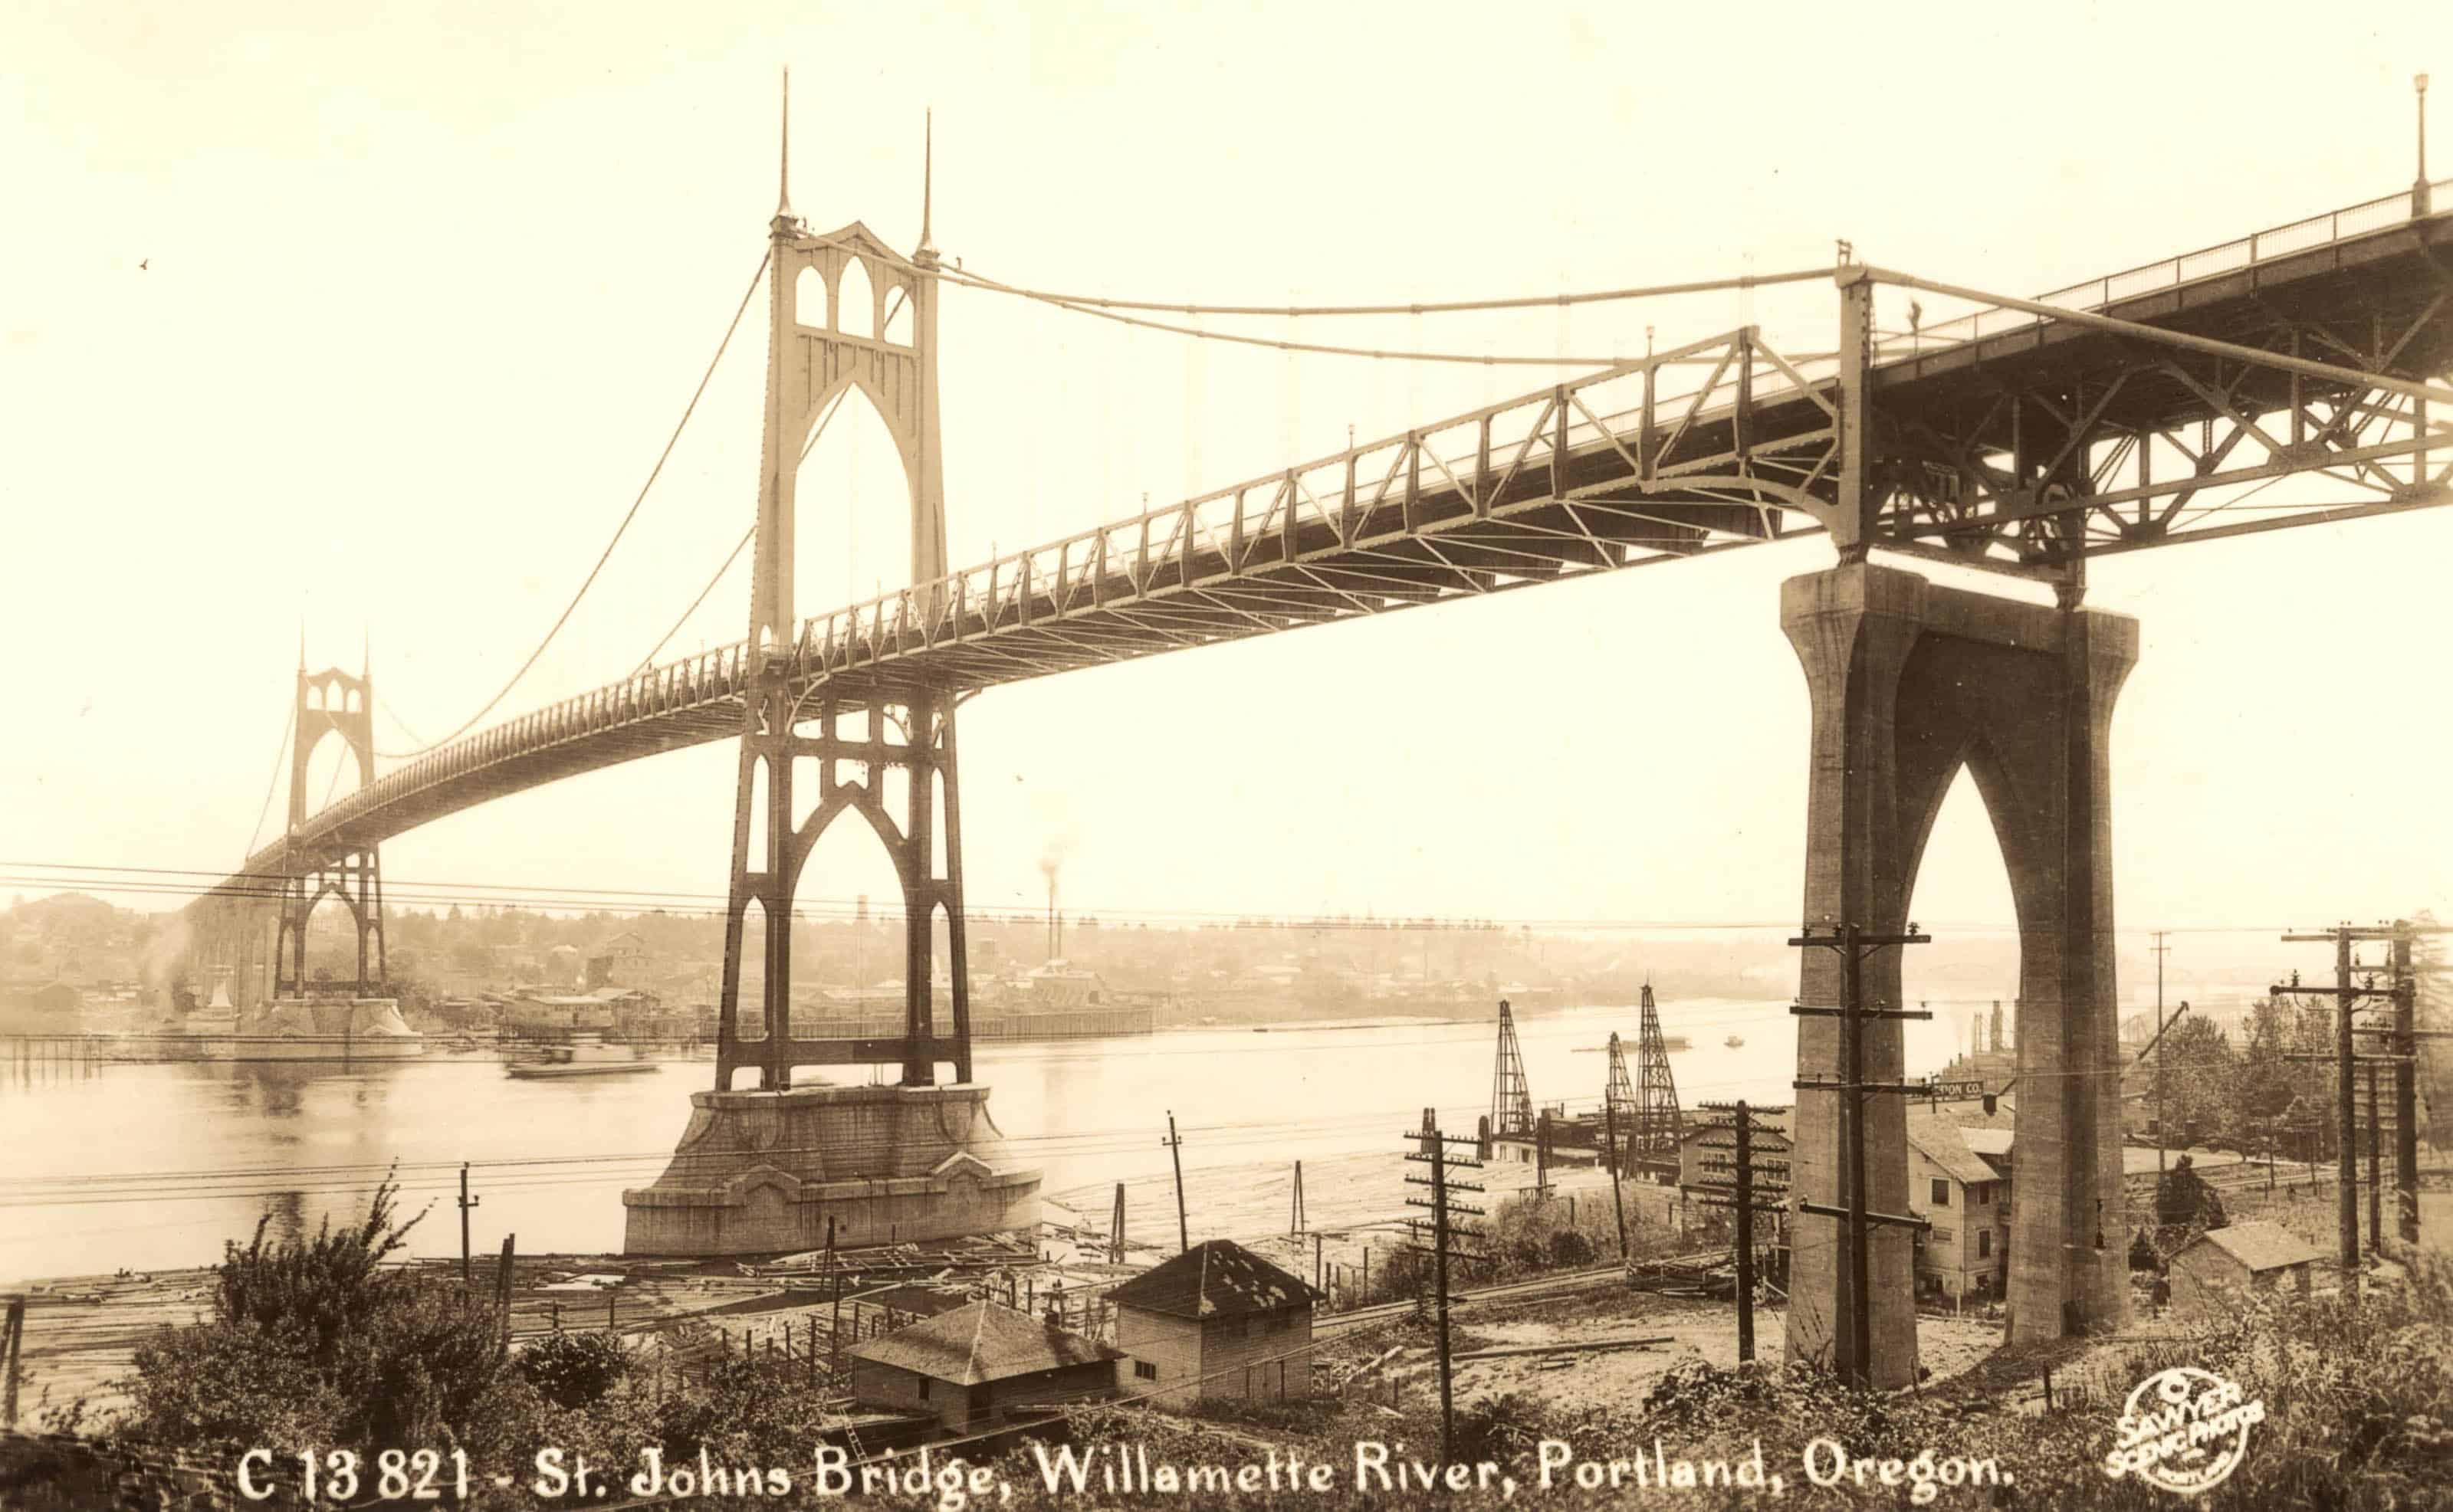 St. Johns Bridge 1937